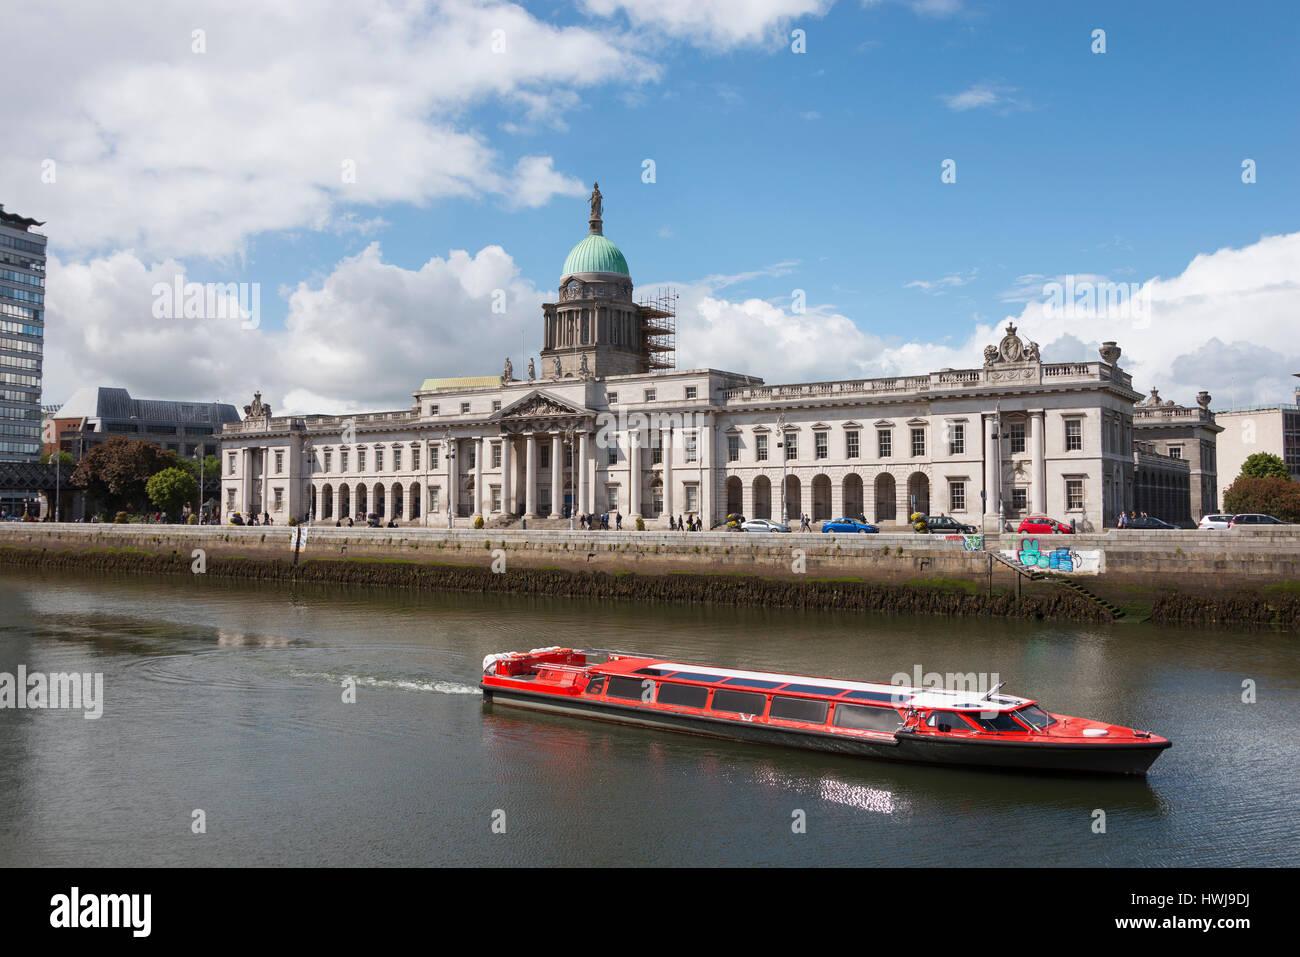 Custom House, River Liffey, Docklands, Dublin, County Dublin, Ireland - Stock Image